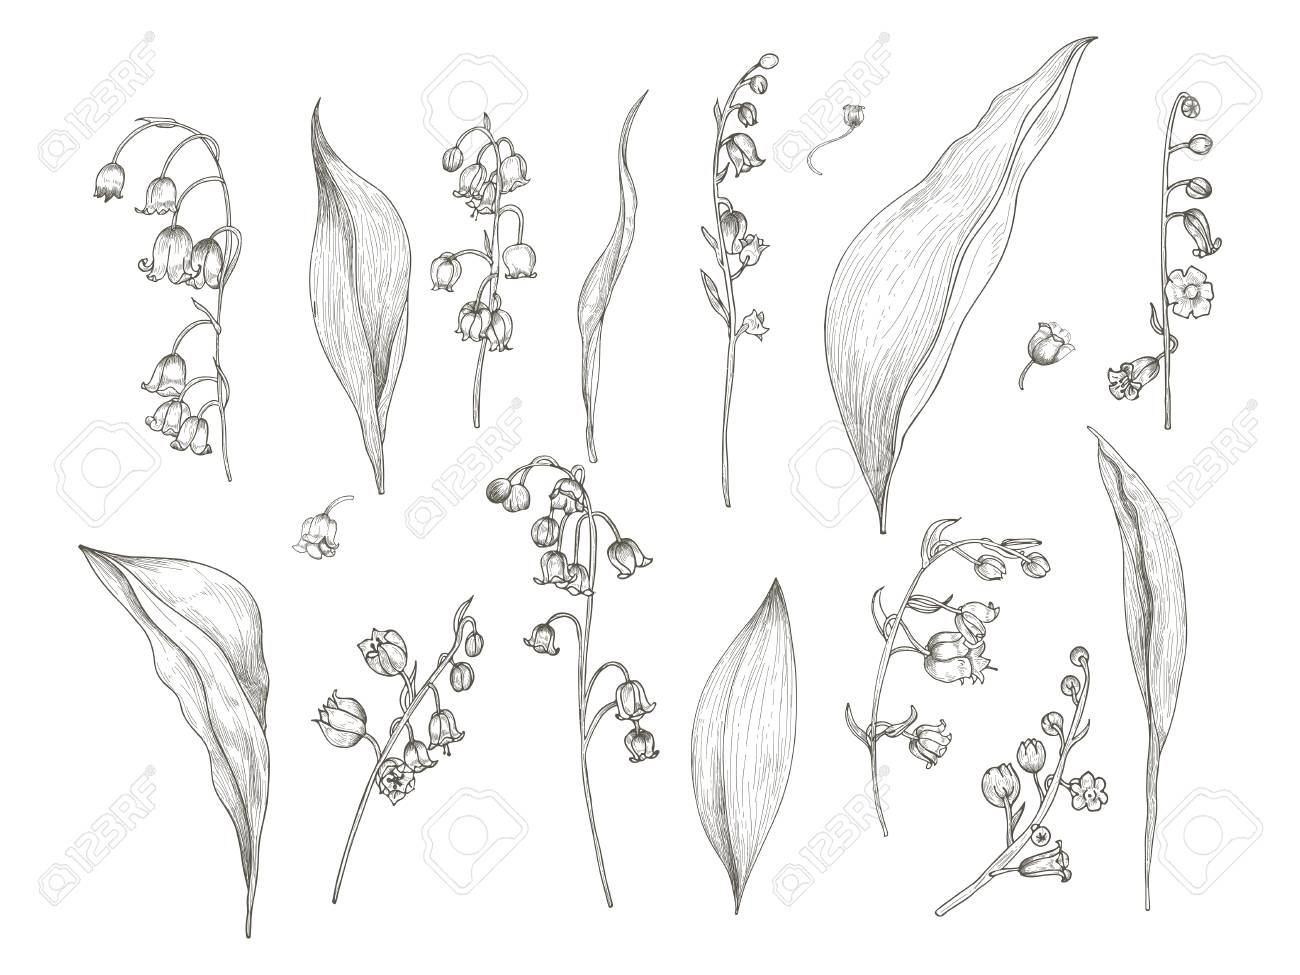 Magnifique Dessin De Muguet Fleur Inflorescence Tige Feuilles